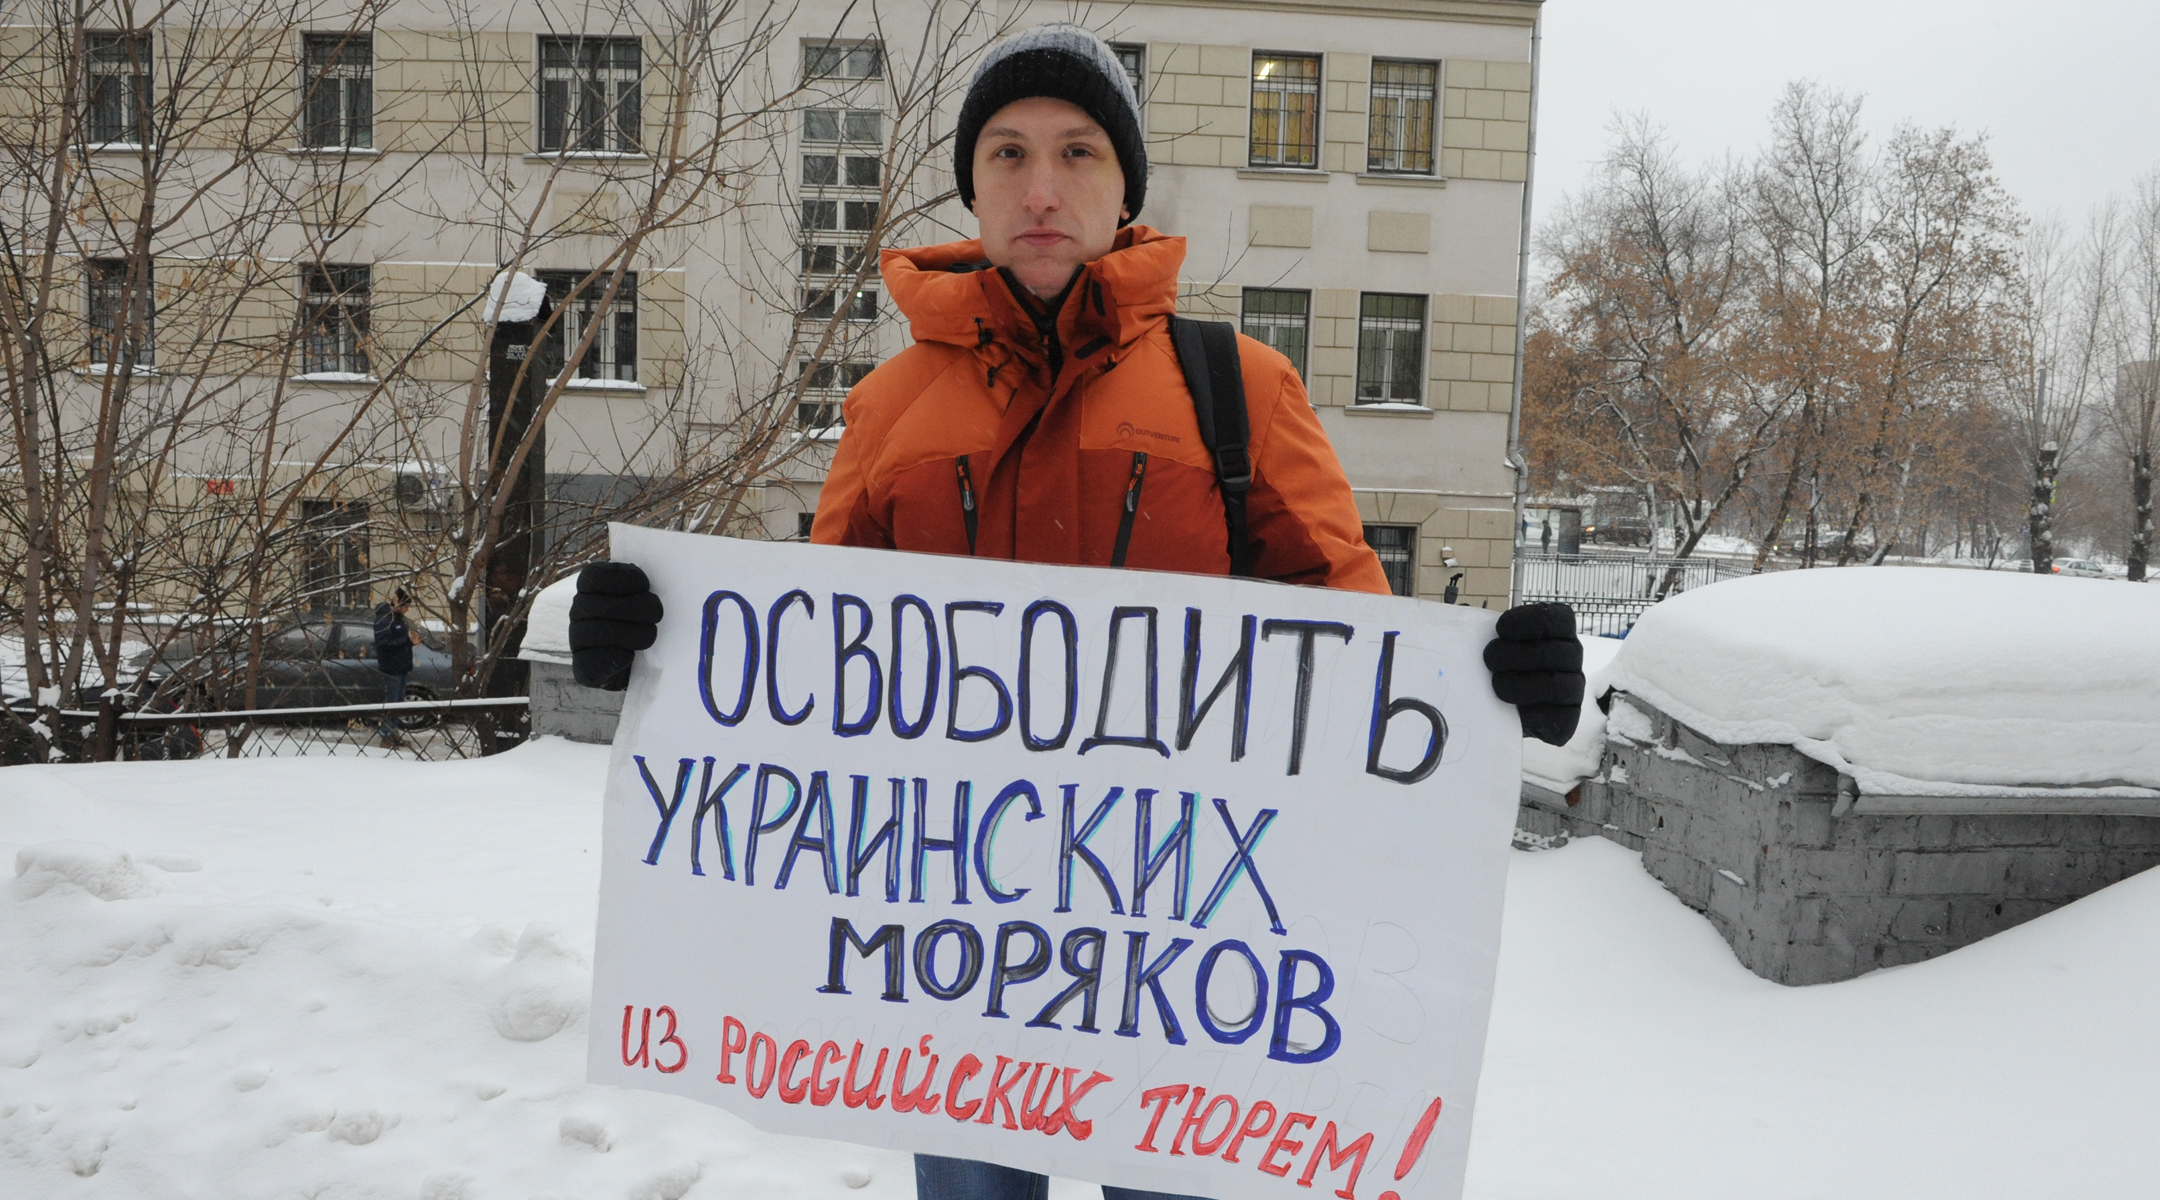 https://static.ukrinform.com/photos/2019_09/1568991398-902.jpg?0.33614824280103095